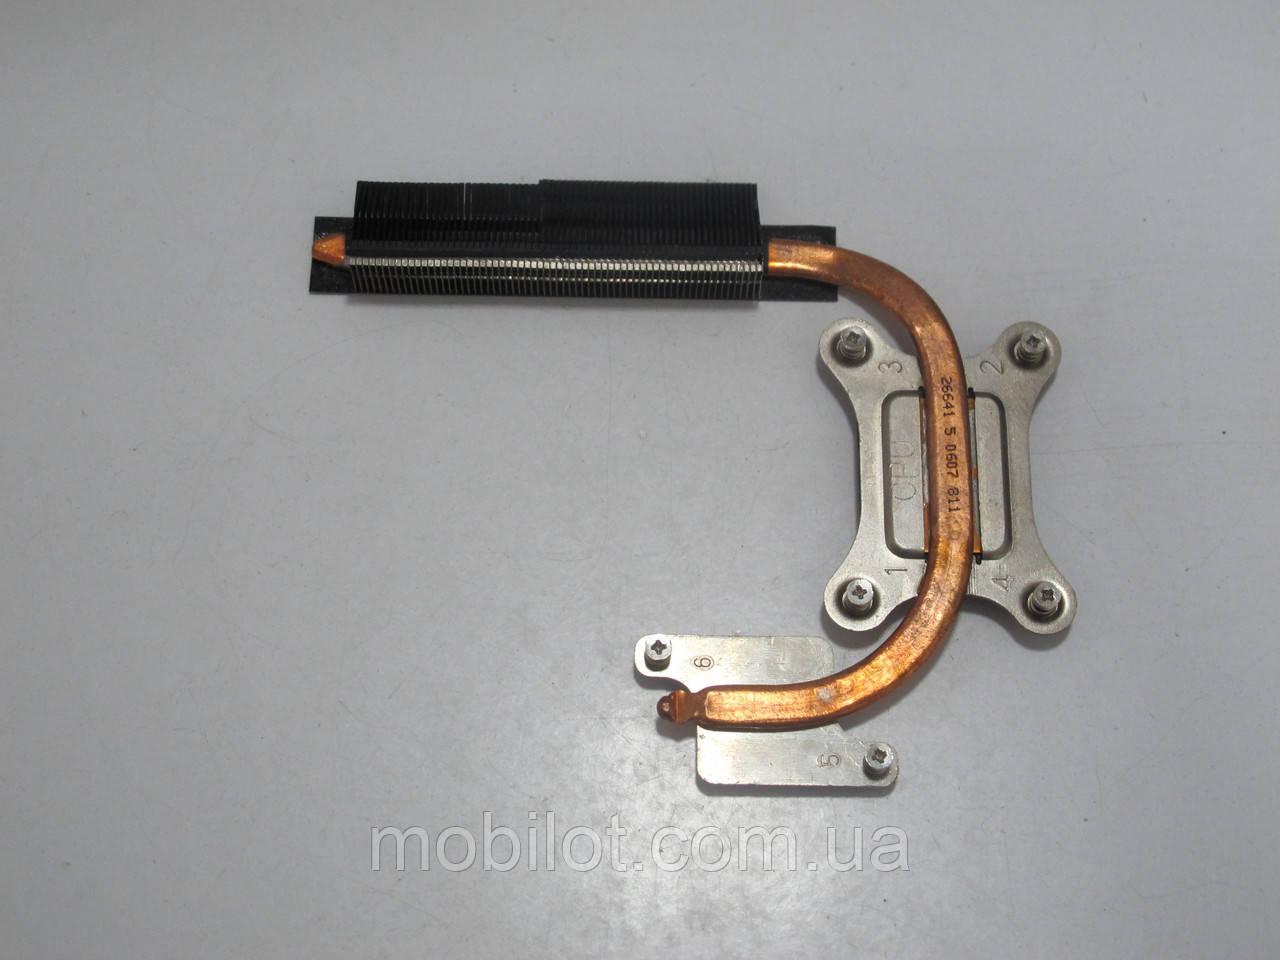 Система охлаждения Samsung RV518 (NZ-7257)